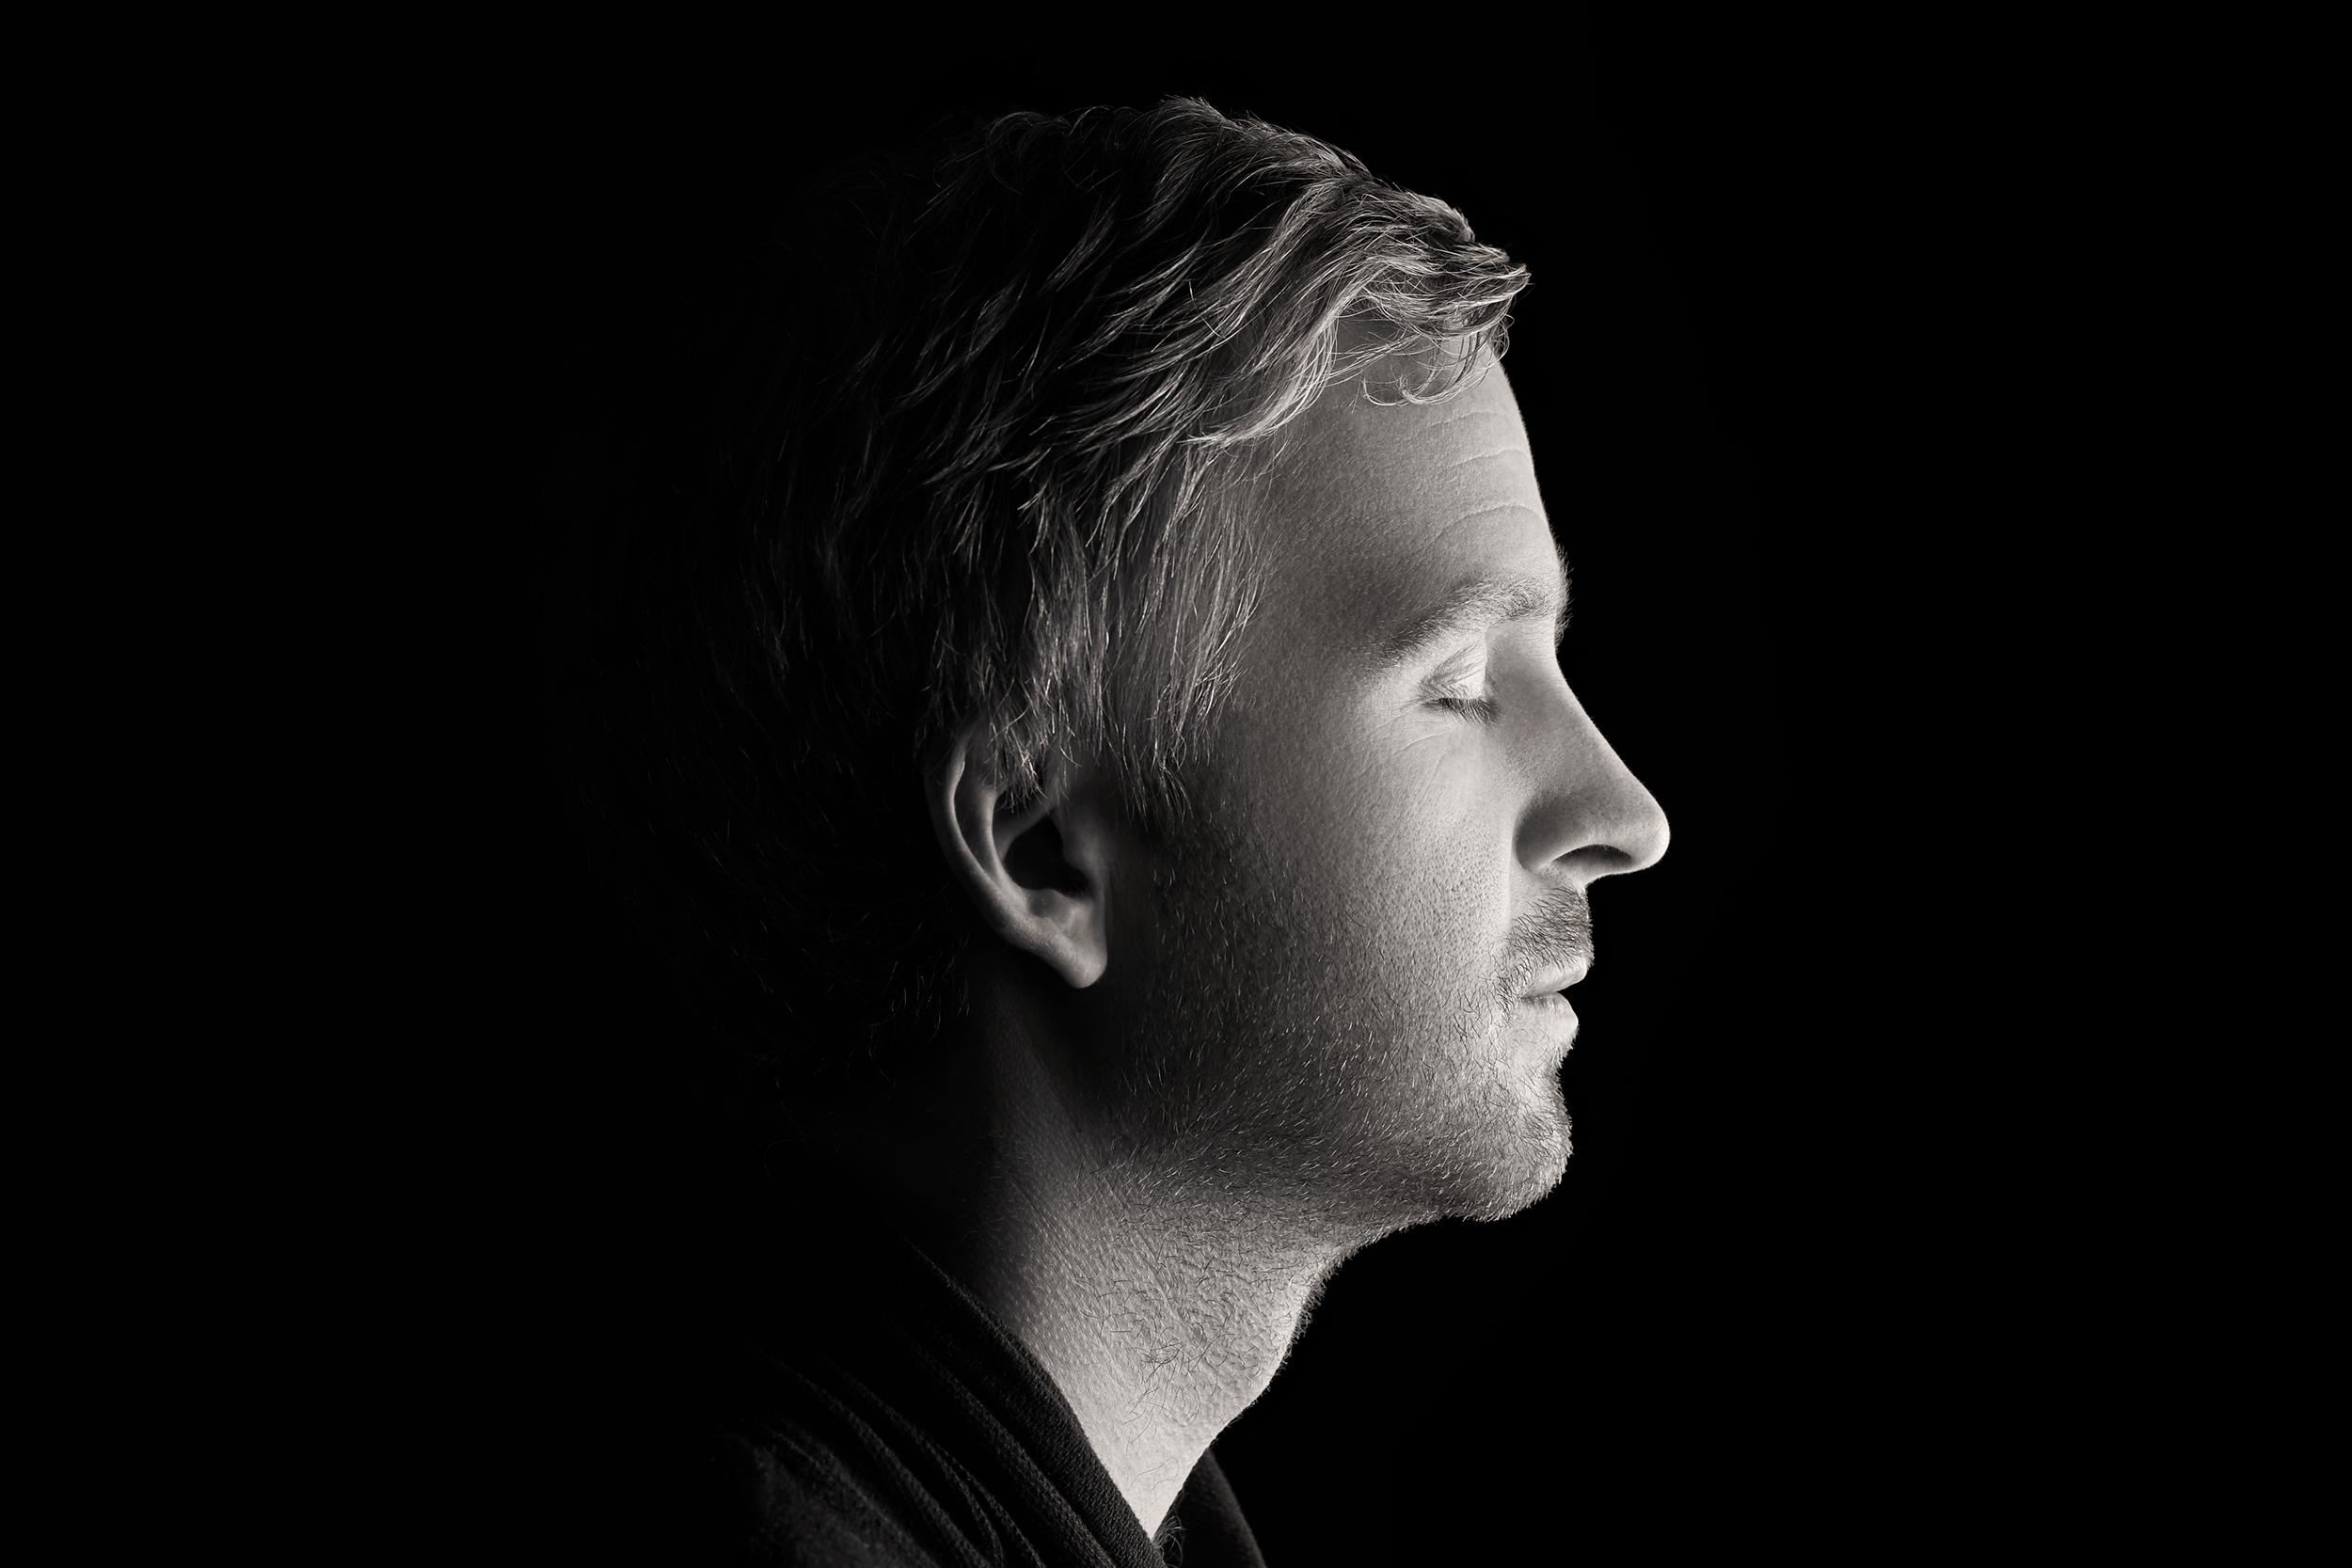 Ólafur Arnalds | Composer